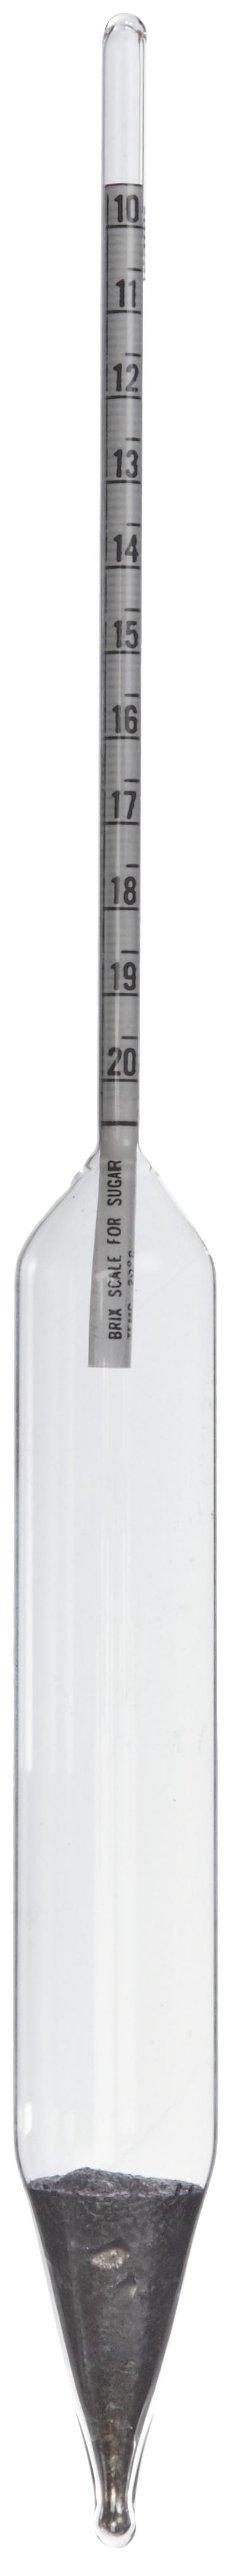 H-B DURAC 10/20 Degree Brix Sugar Scale Hydrometer (B61802-0200)